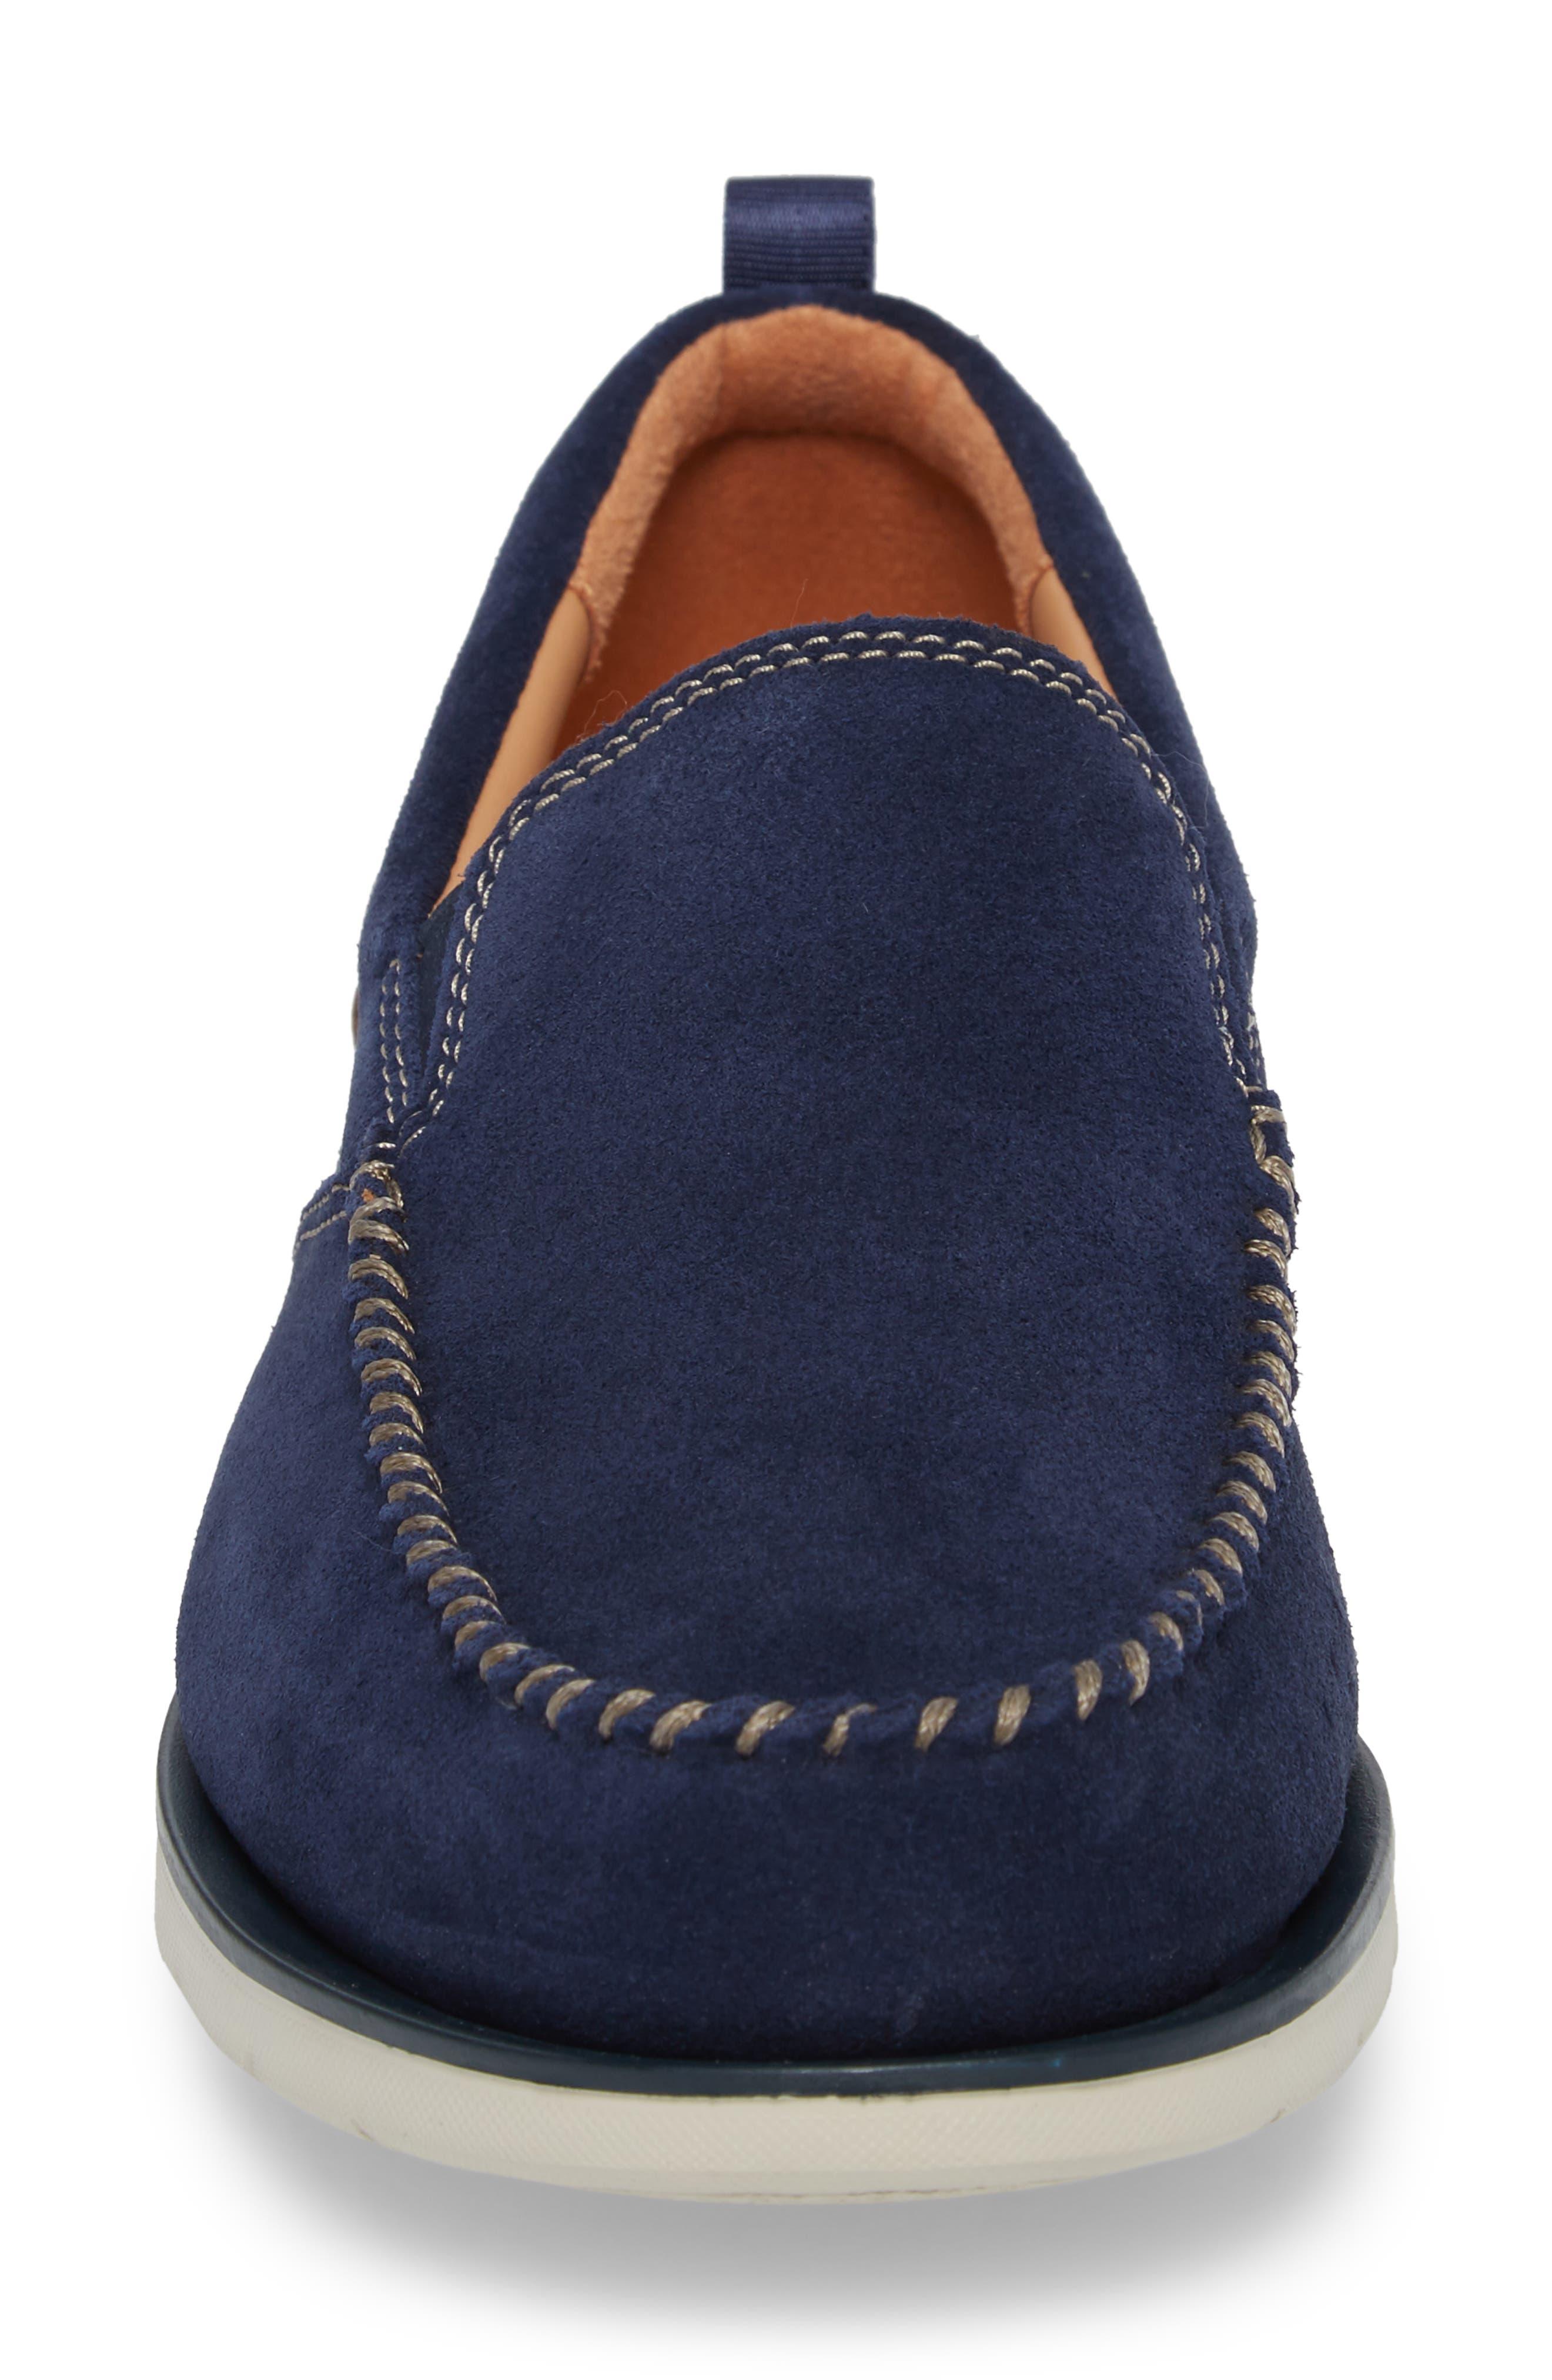 Edgewood Step Moc Toe Loafer,                             Alternate thumbnail 4, color,                             Blue Suede